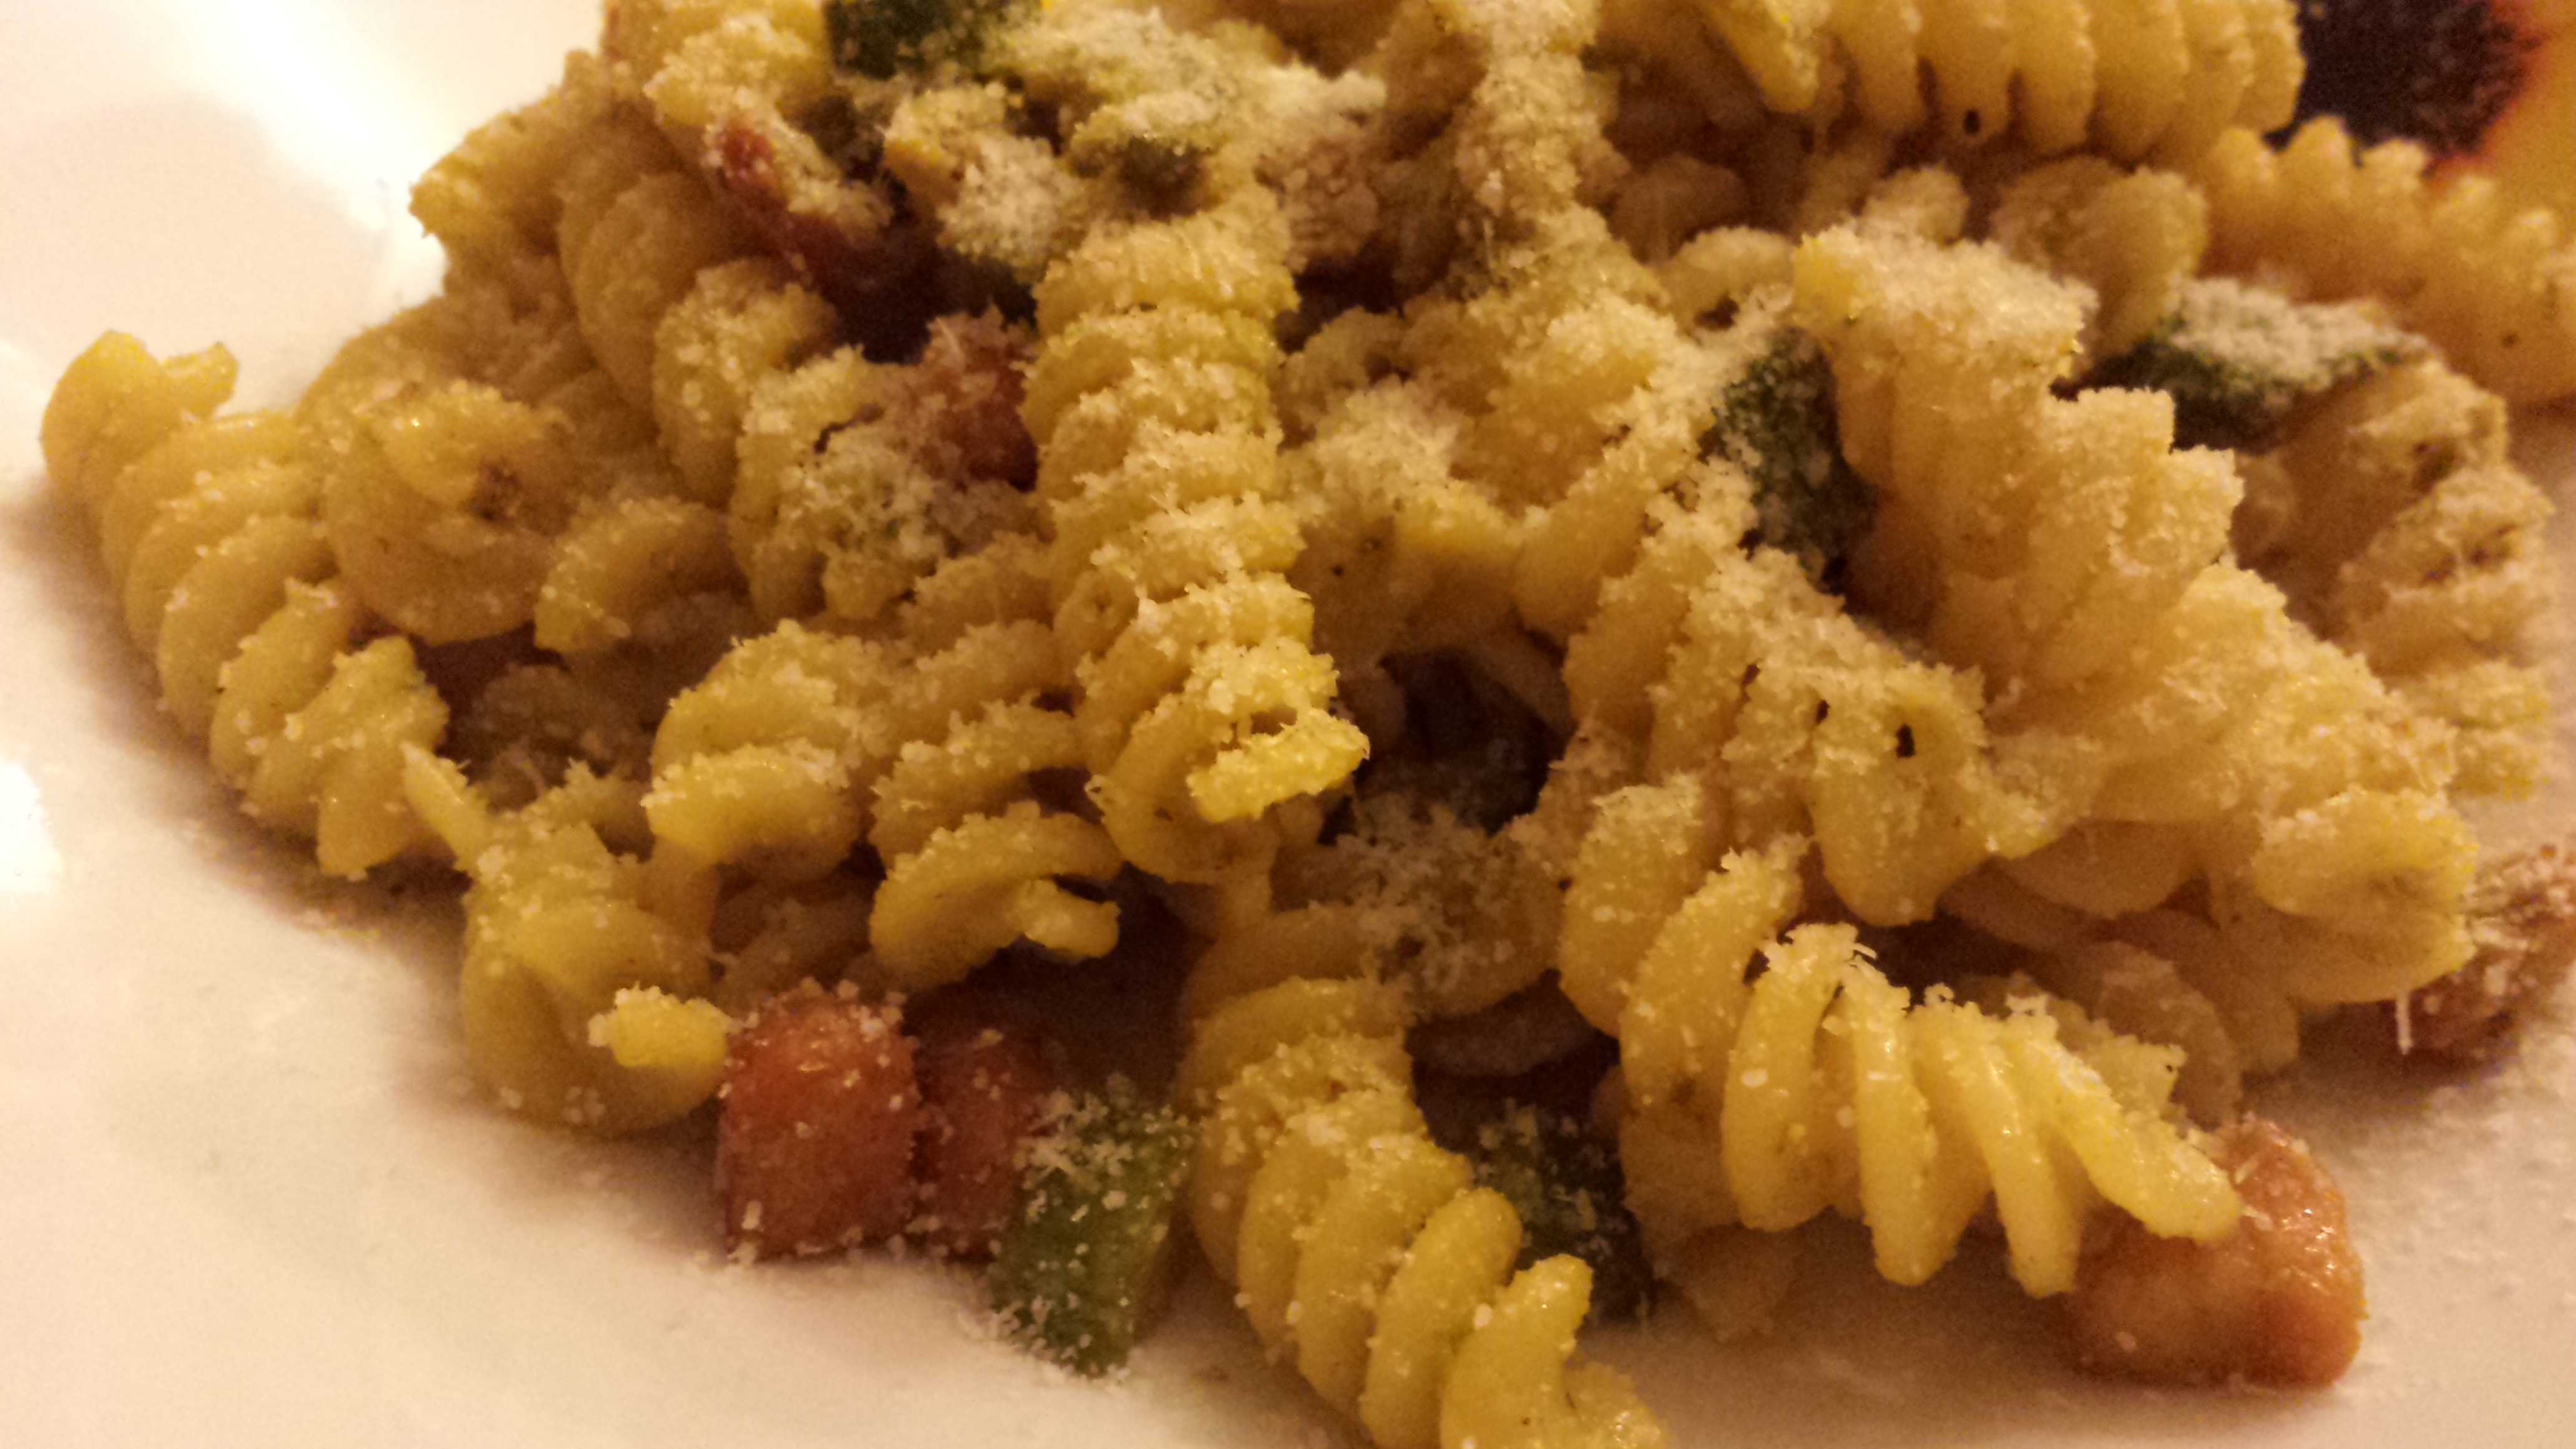 Pasta con zucchine, pancetta affumicata e zafferano